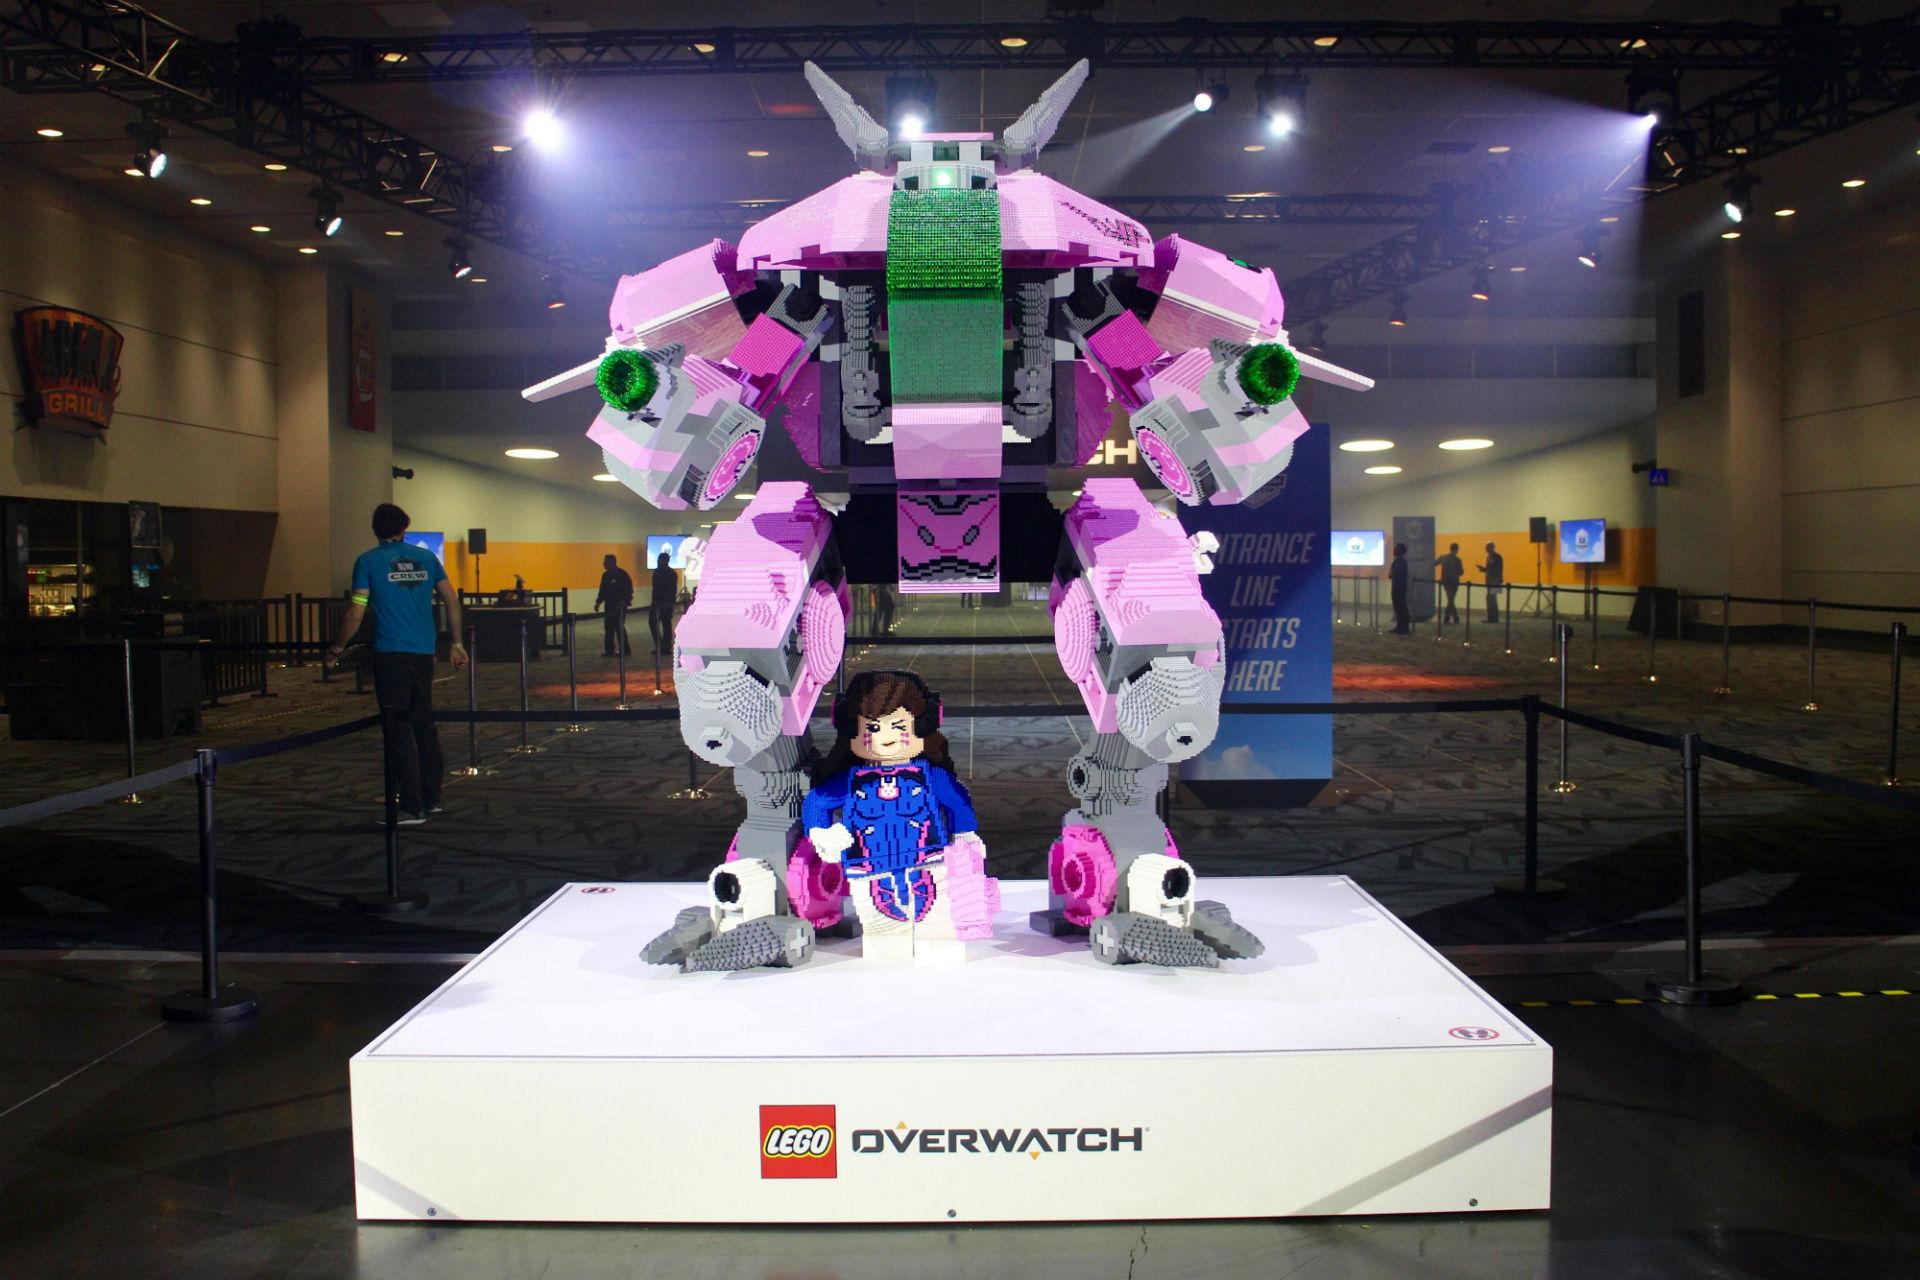 Overwatch-LEGO presenterades officiellt på BlizzCon